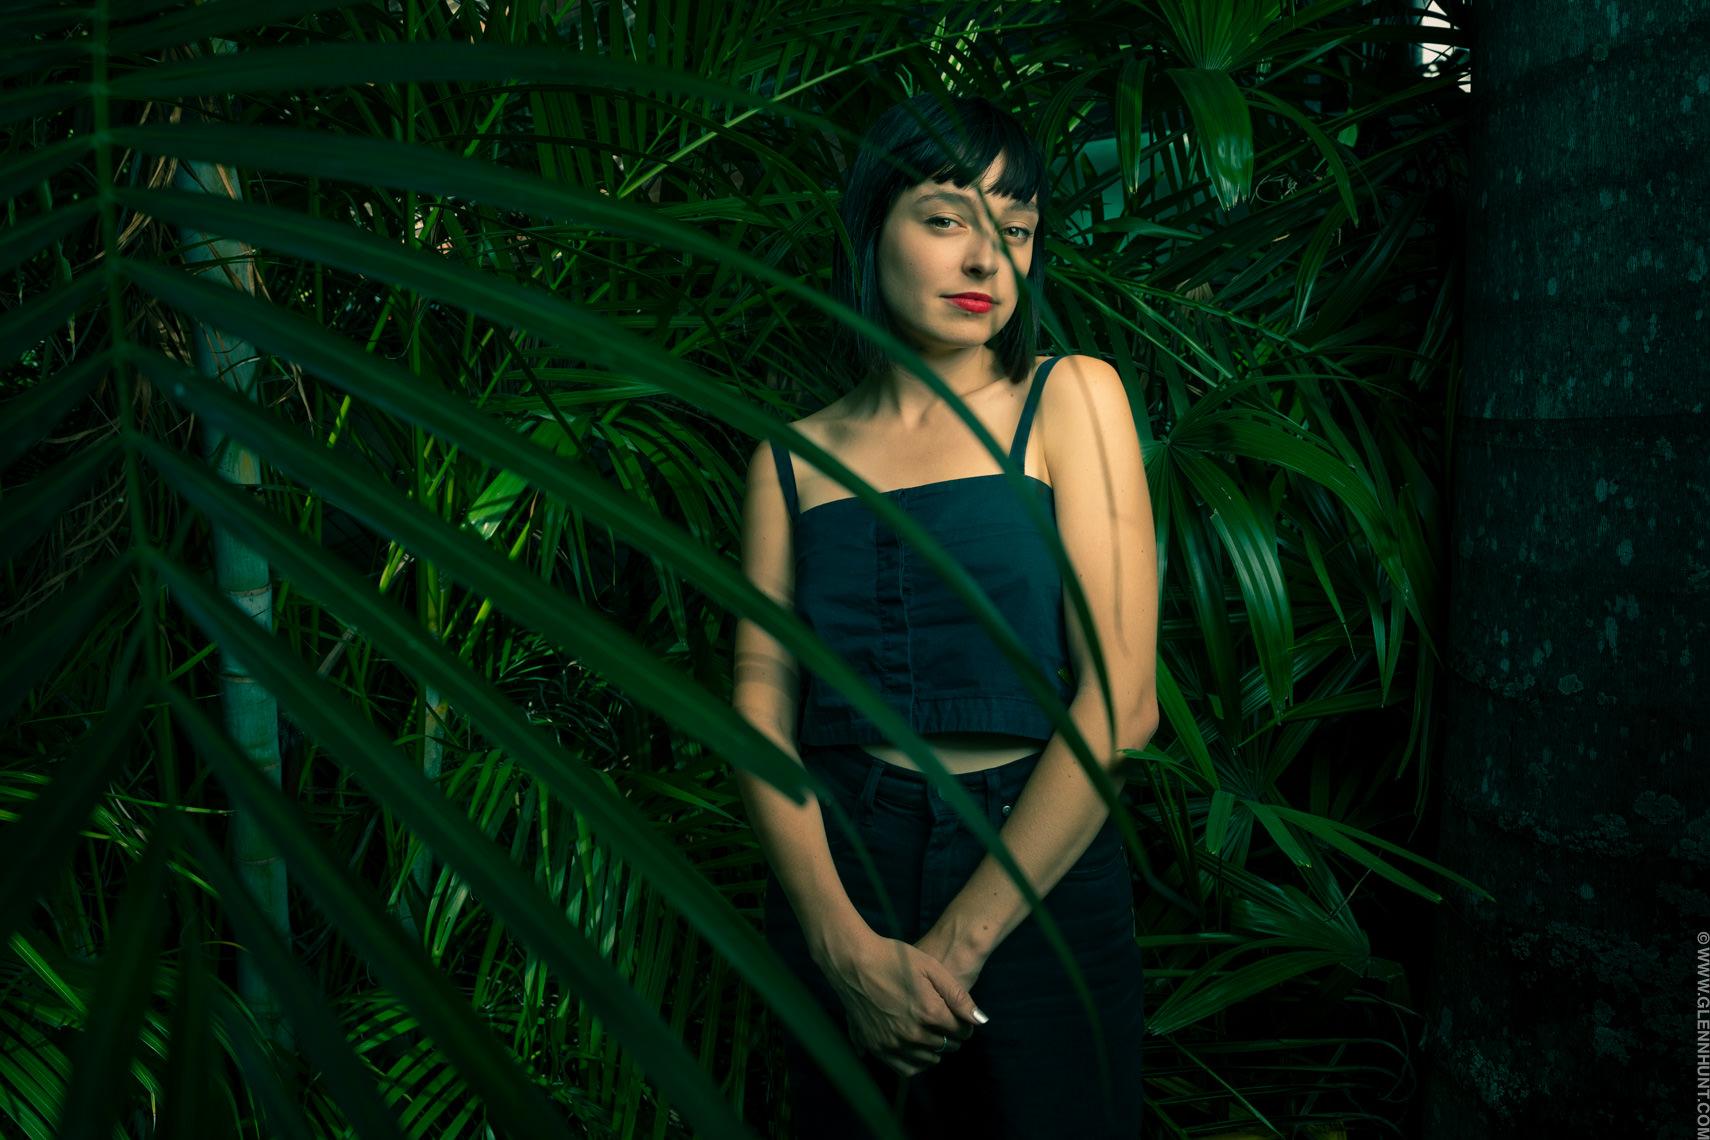 Music Portrait Photography